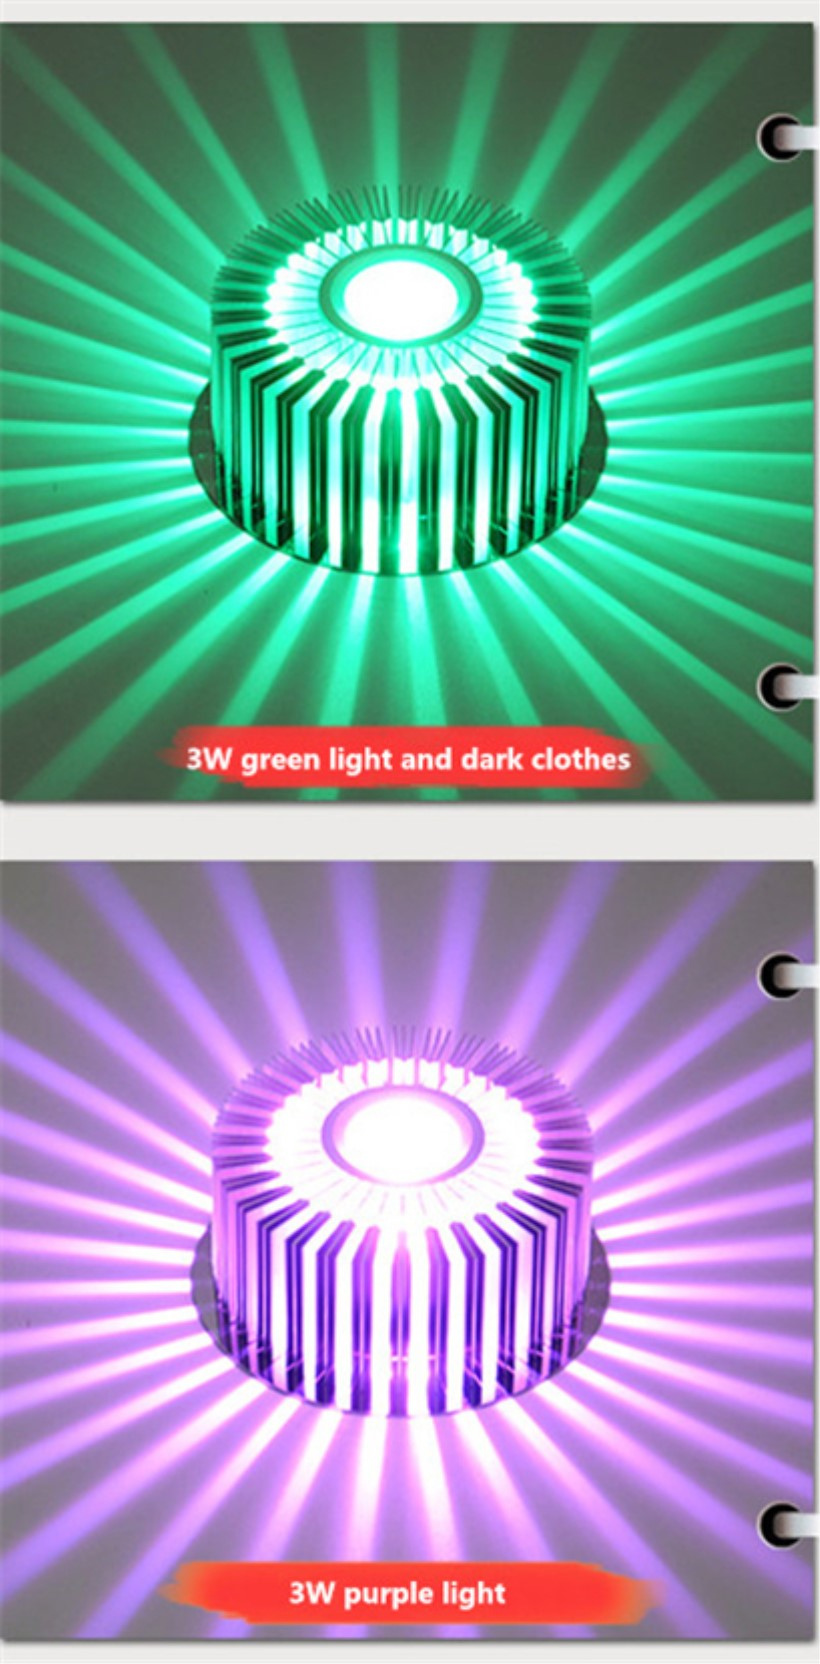 LED Crystal Aisle Celling Light (6)